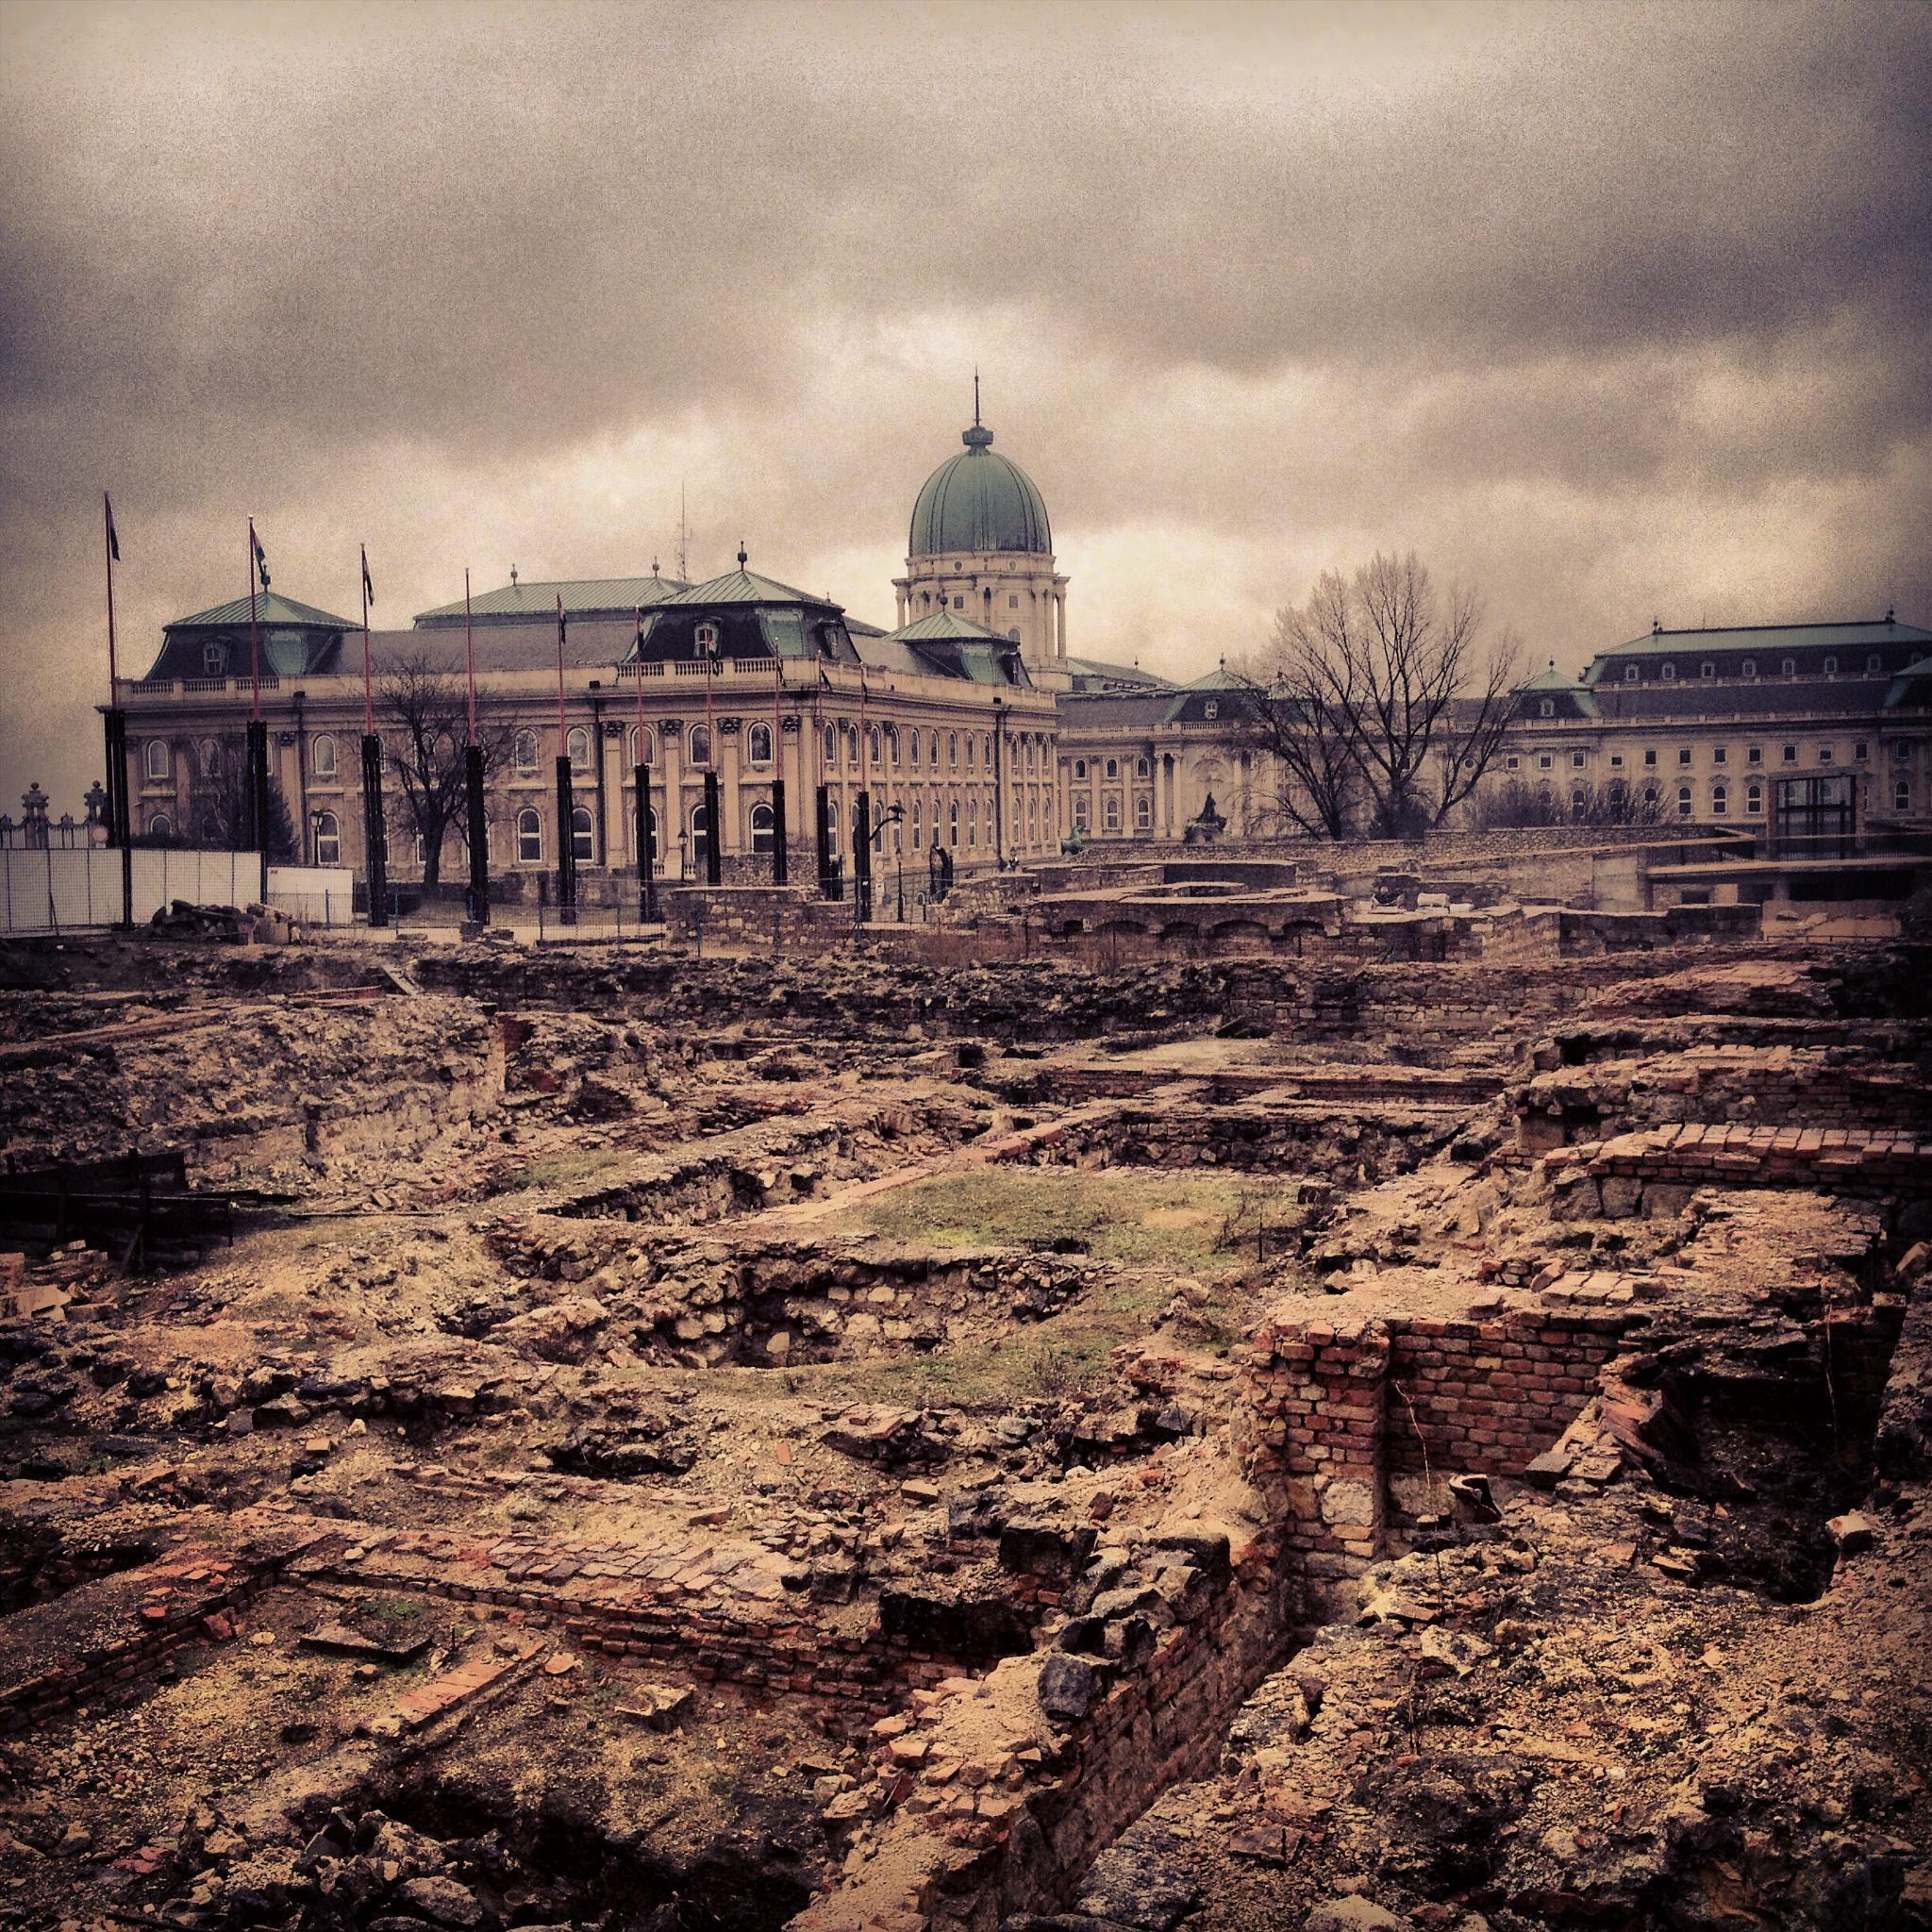 Ruins by Thomas Ryste